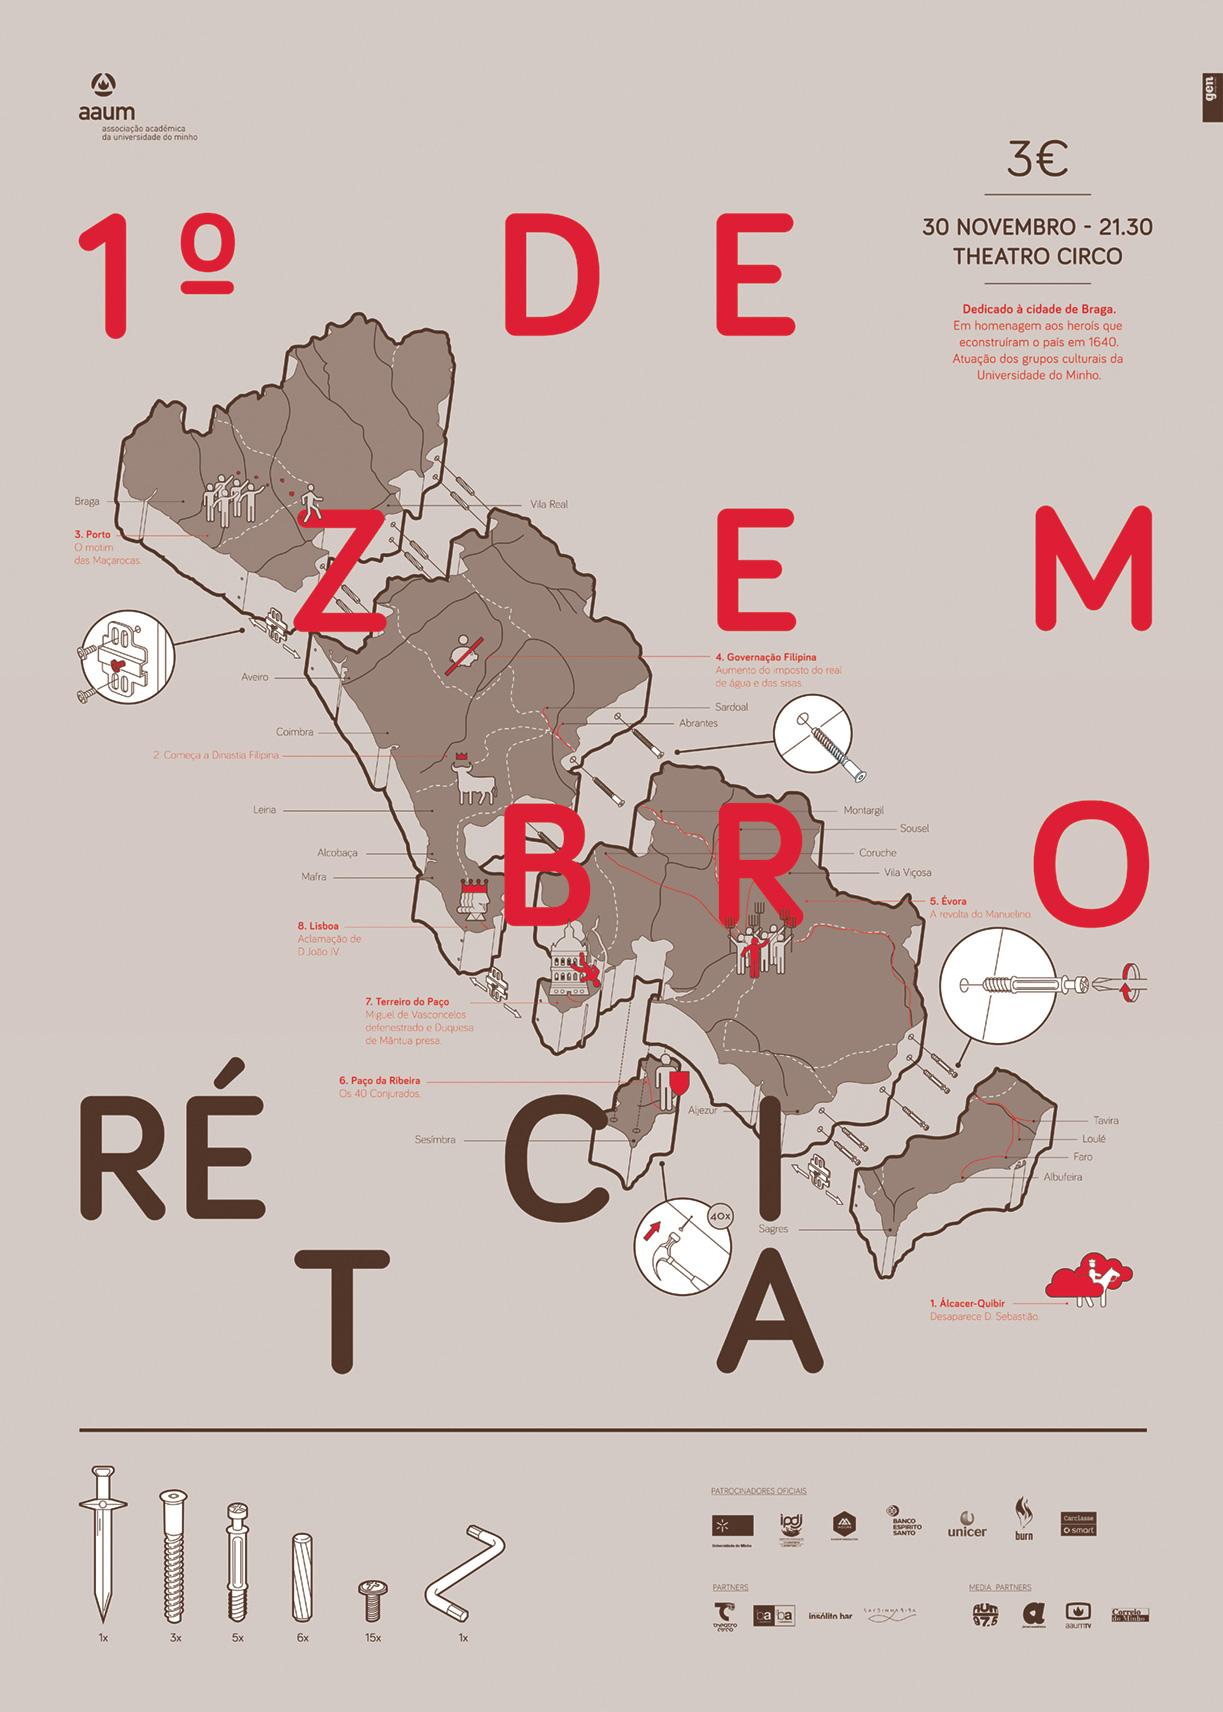 1º Dezembro poster by Gen Design Studio